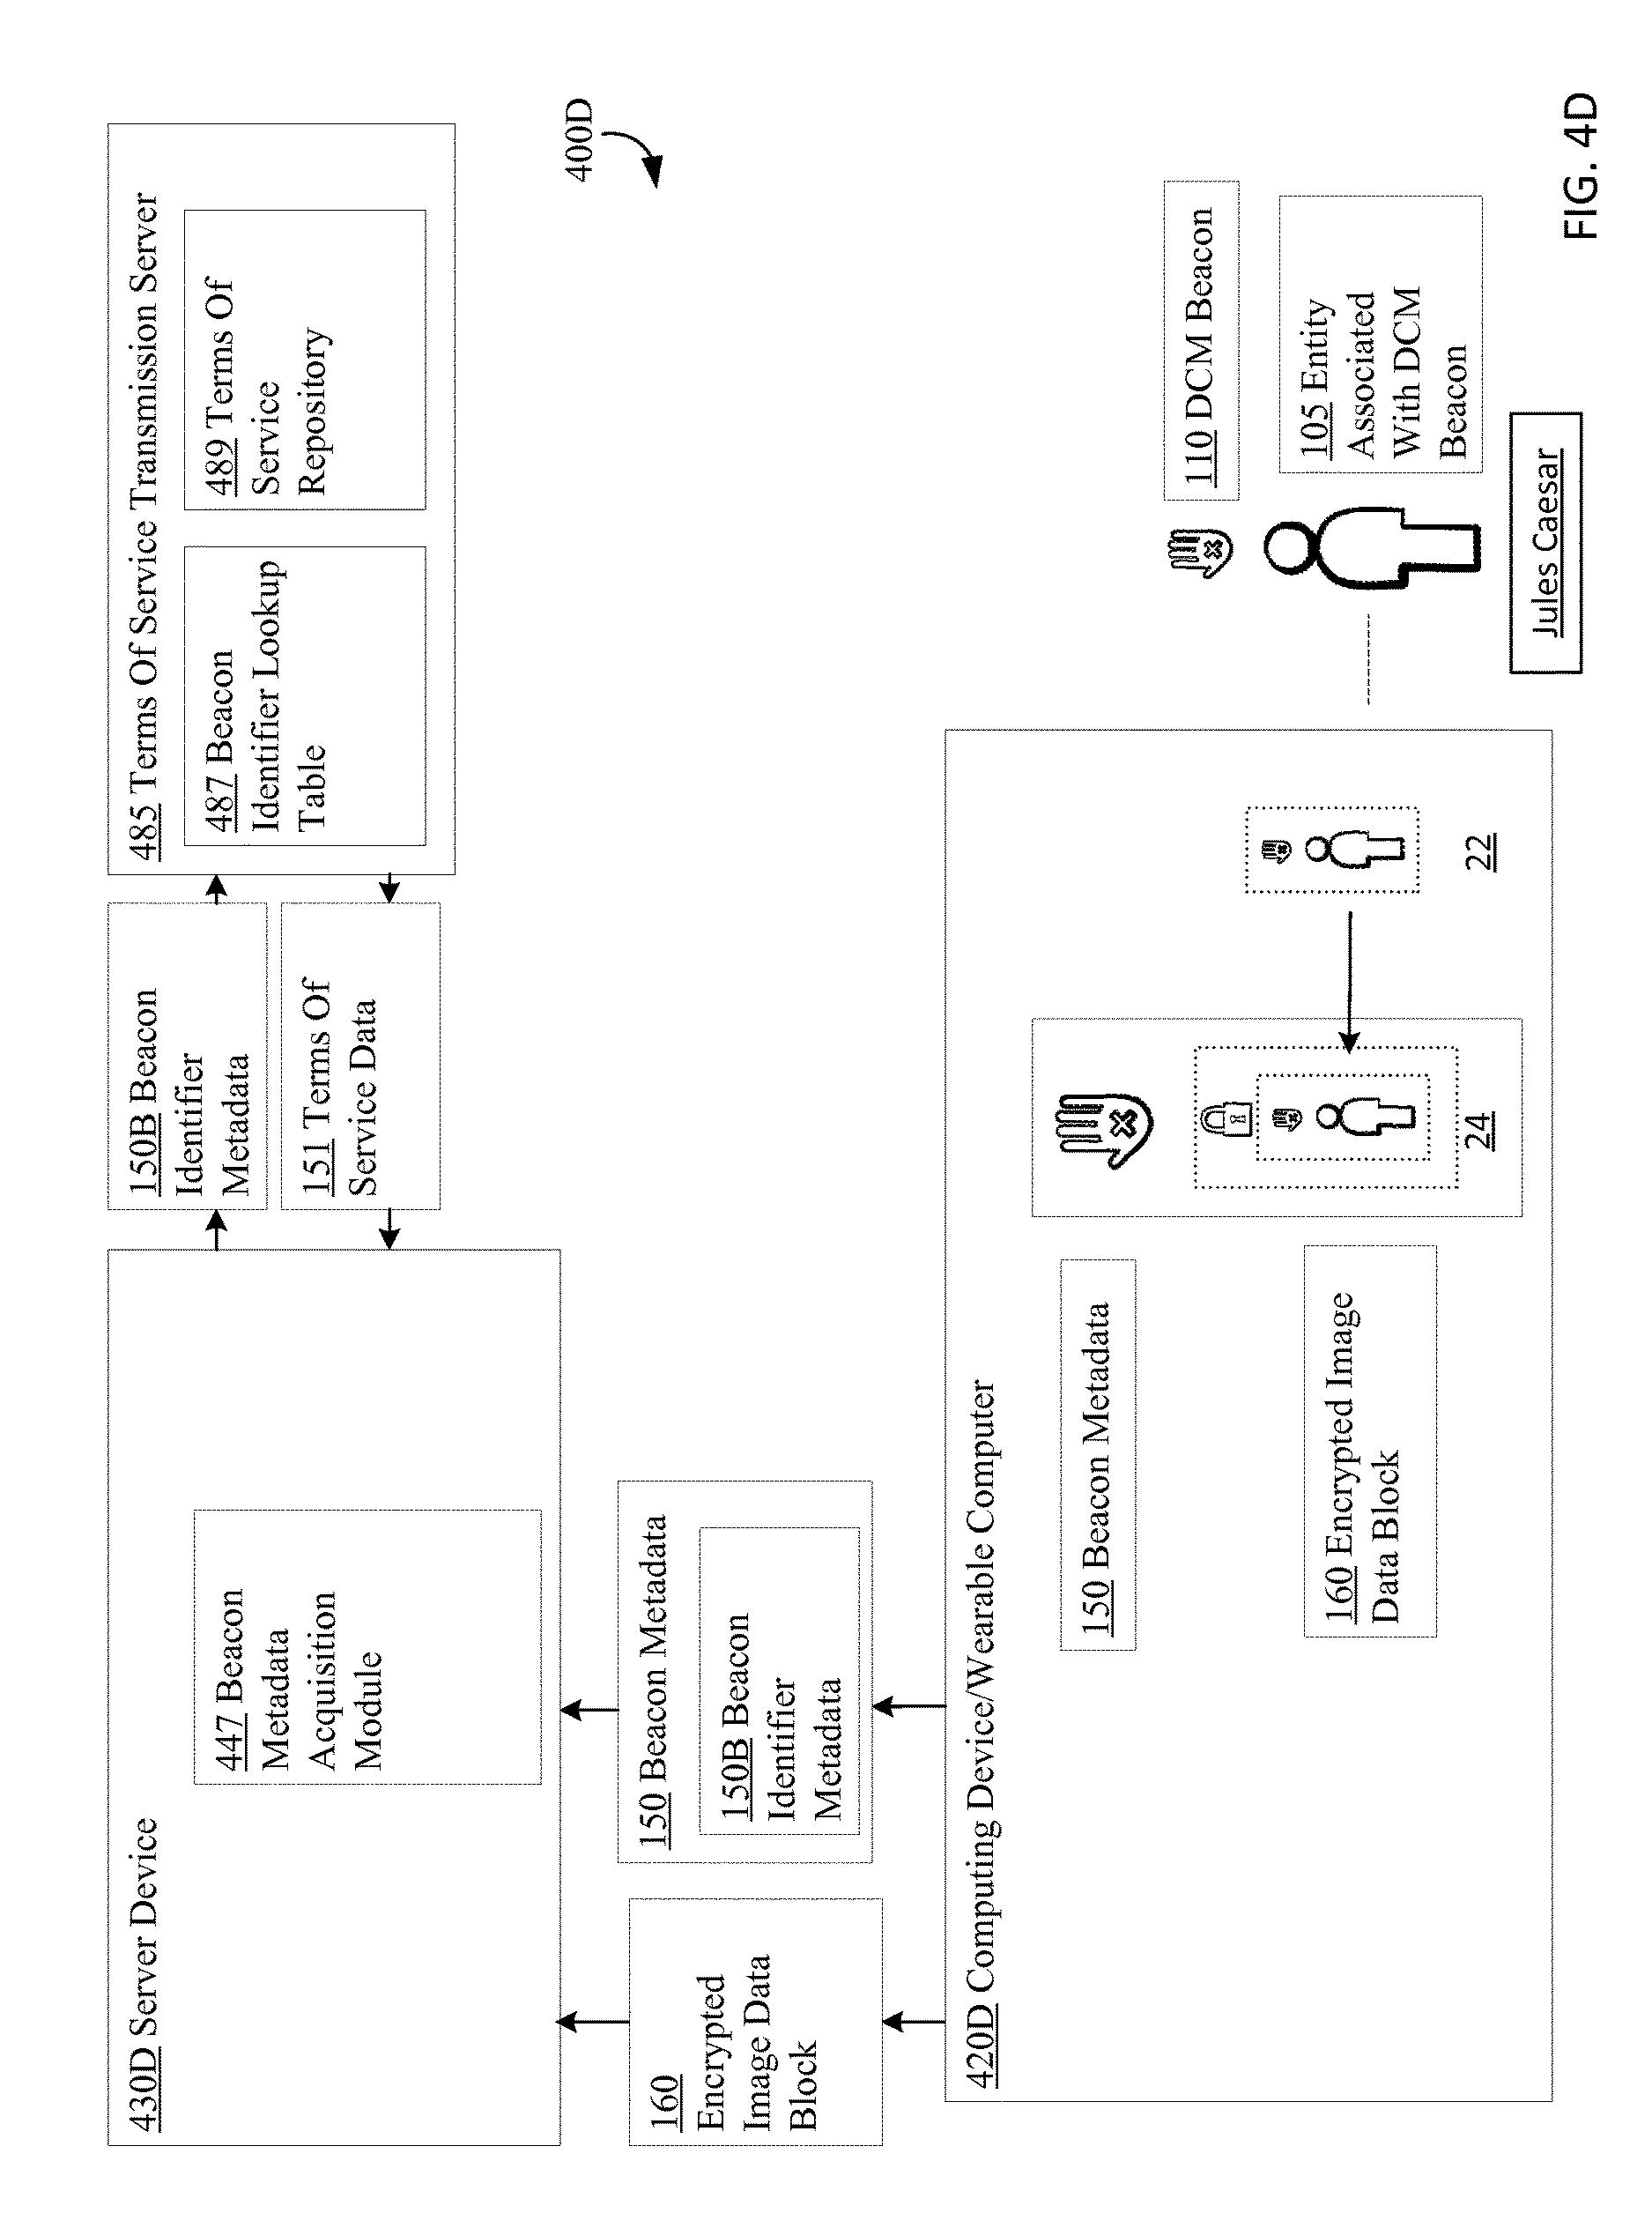 Patent US 9,799,036 B2 on 1990 skylark fuse diagram, yamaha outboard wiring diagram, temperature diagram,